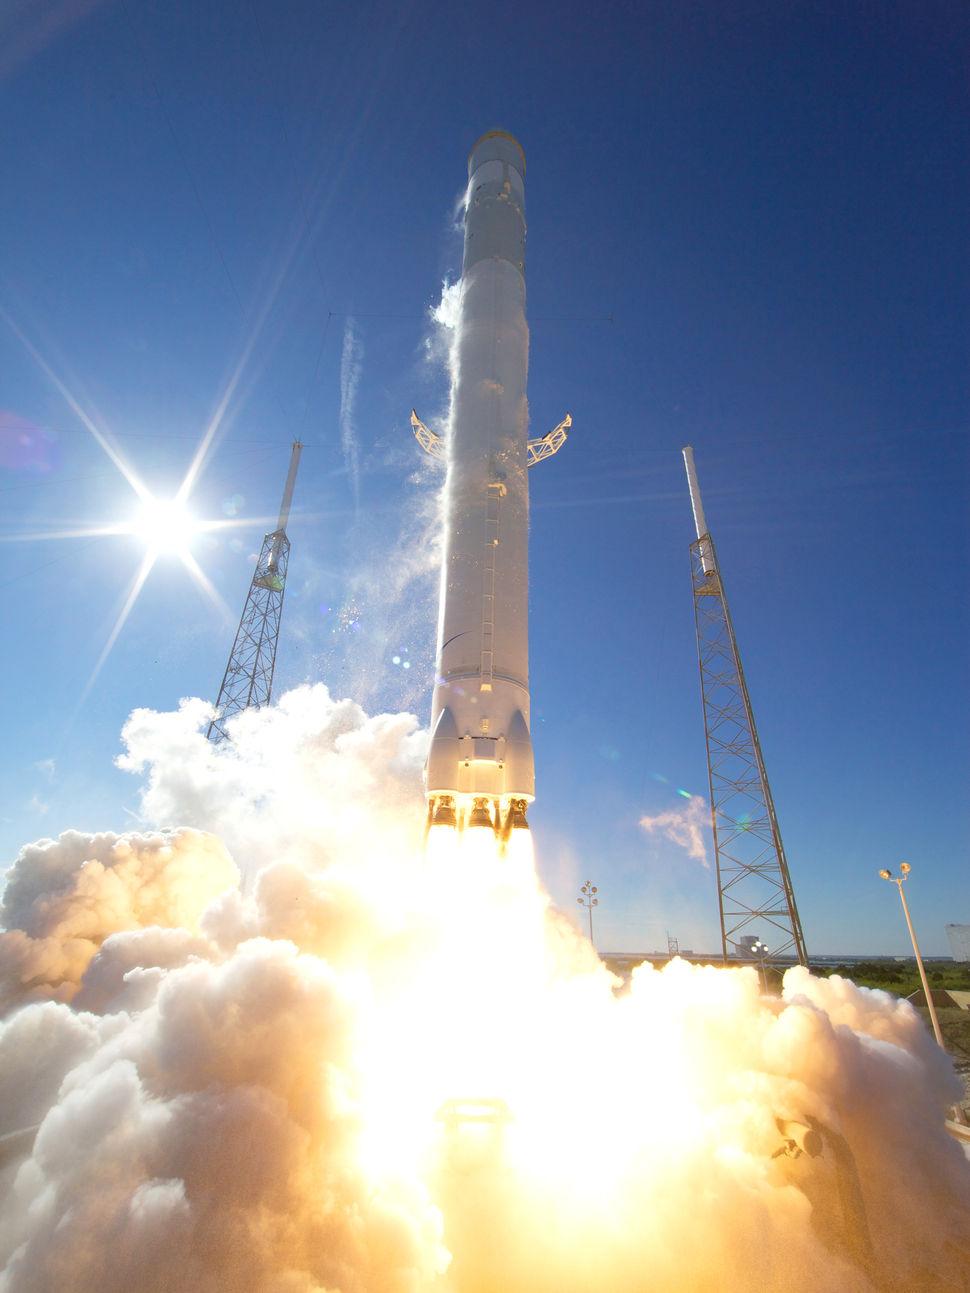 falcon_9_dragon_launch_12-8-10_credit_chris_thompson_spacex_2_0.jpg